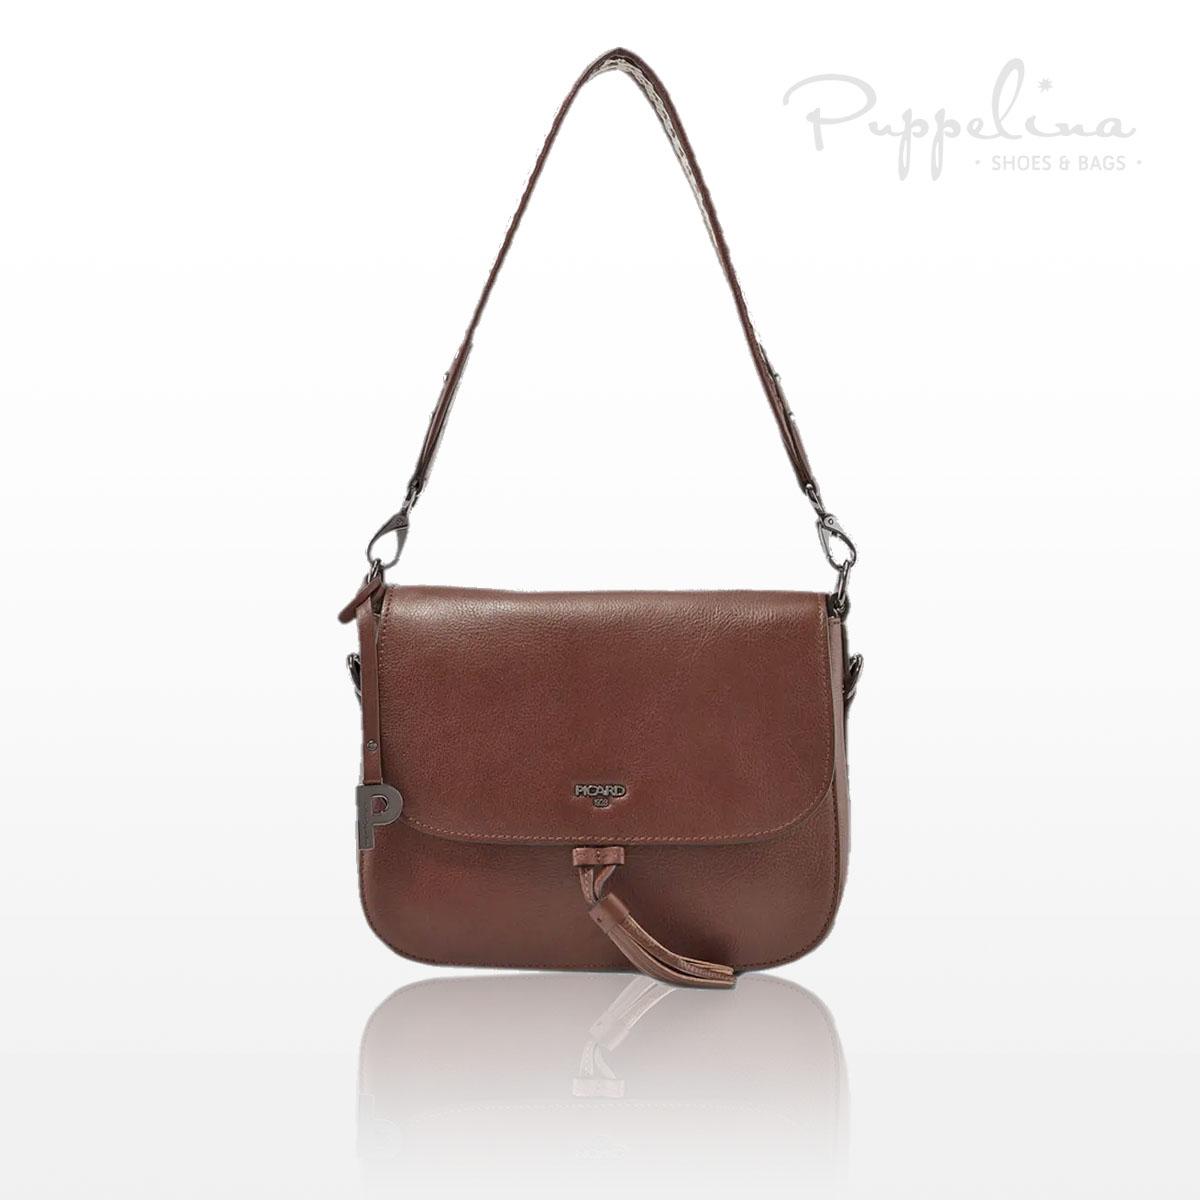 Puppelina-acc-P1086